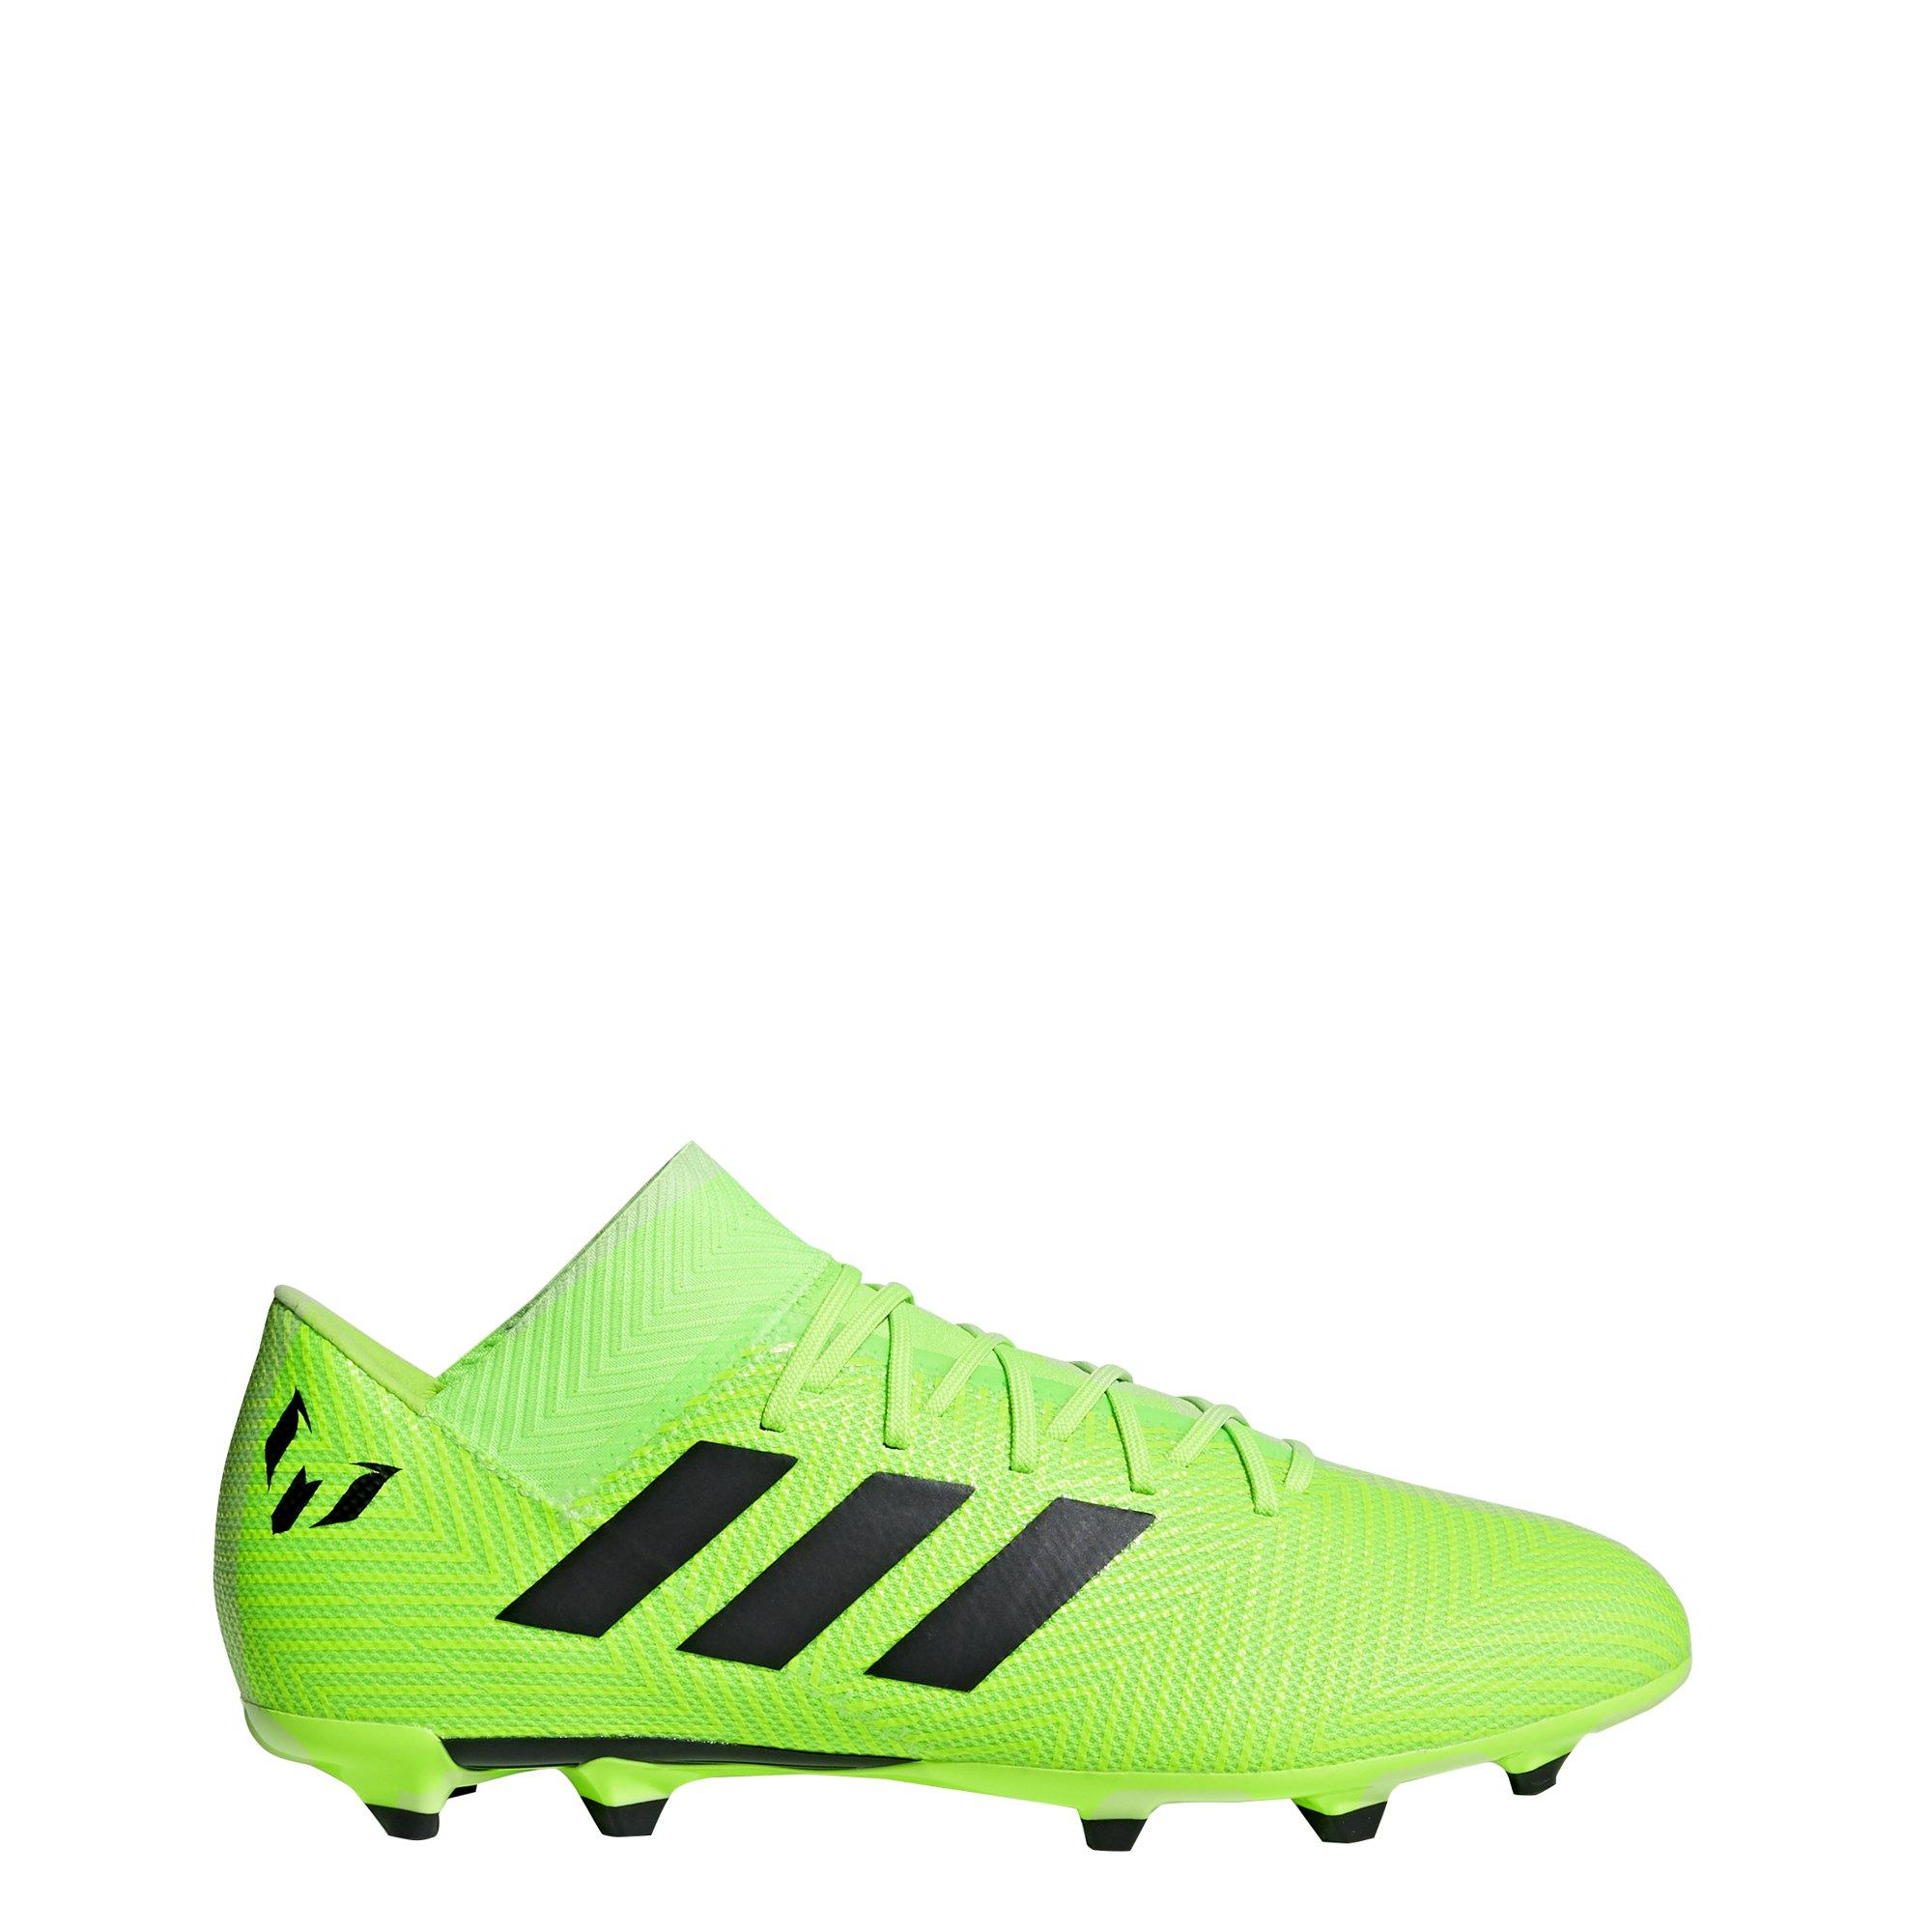 adidas Men's Nemeziz Messi 18.3 Firm Ground Soccer Shoe, Solar Green/Black/Solar Green, 6.5 M US by adidas